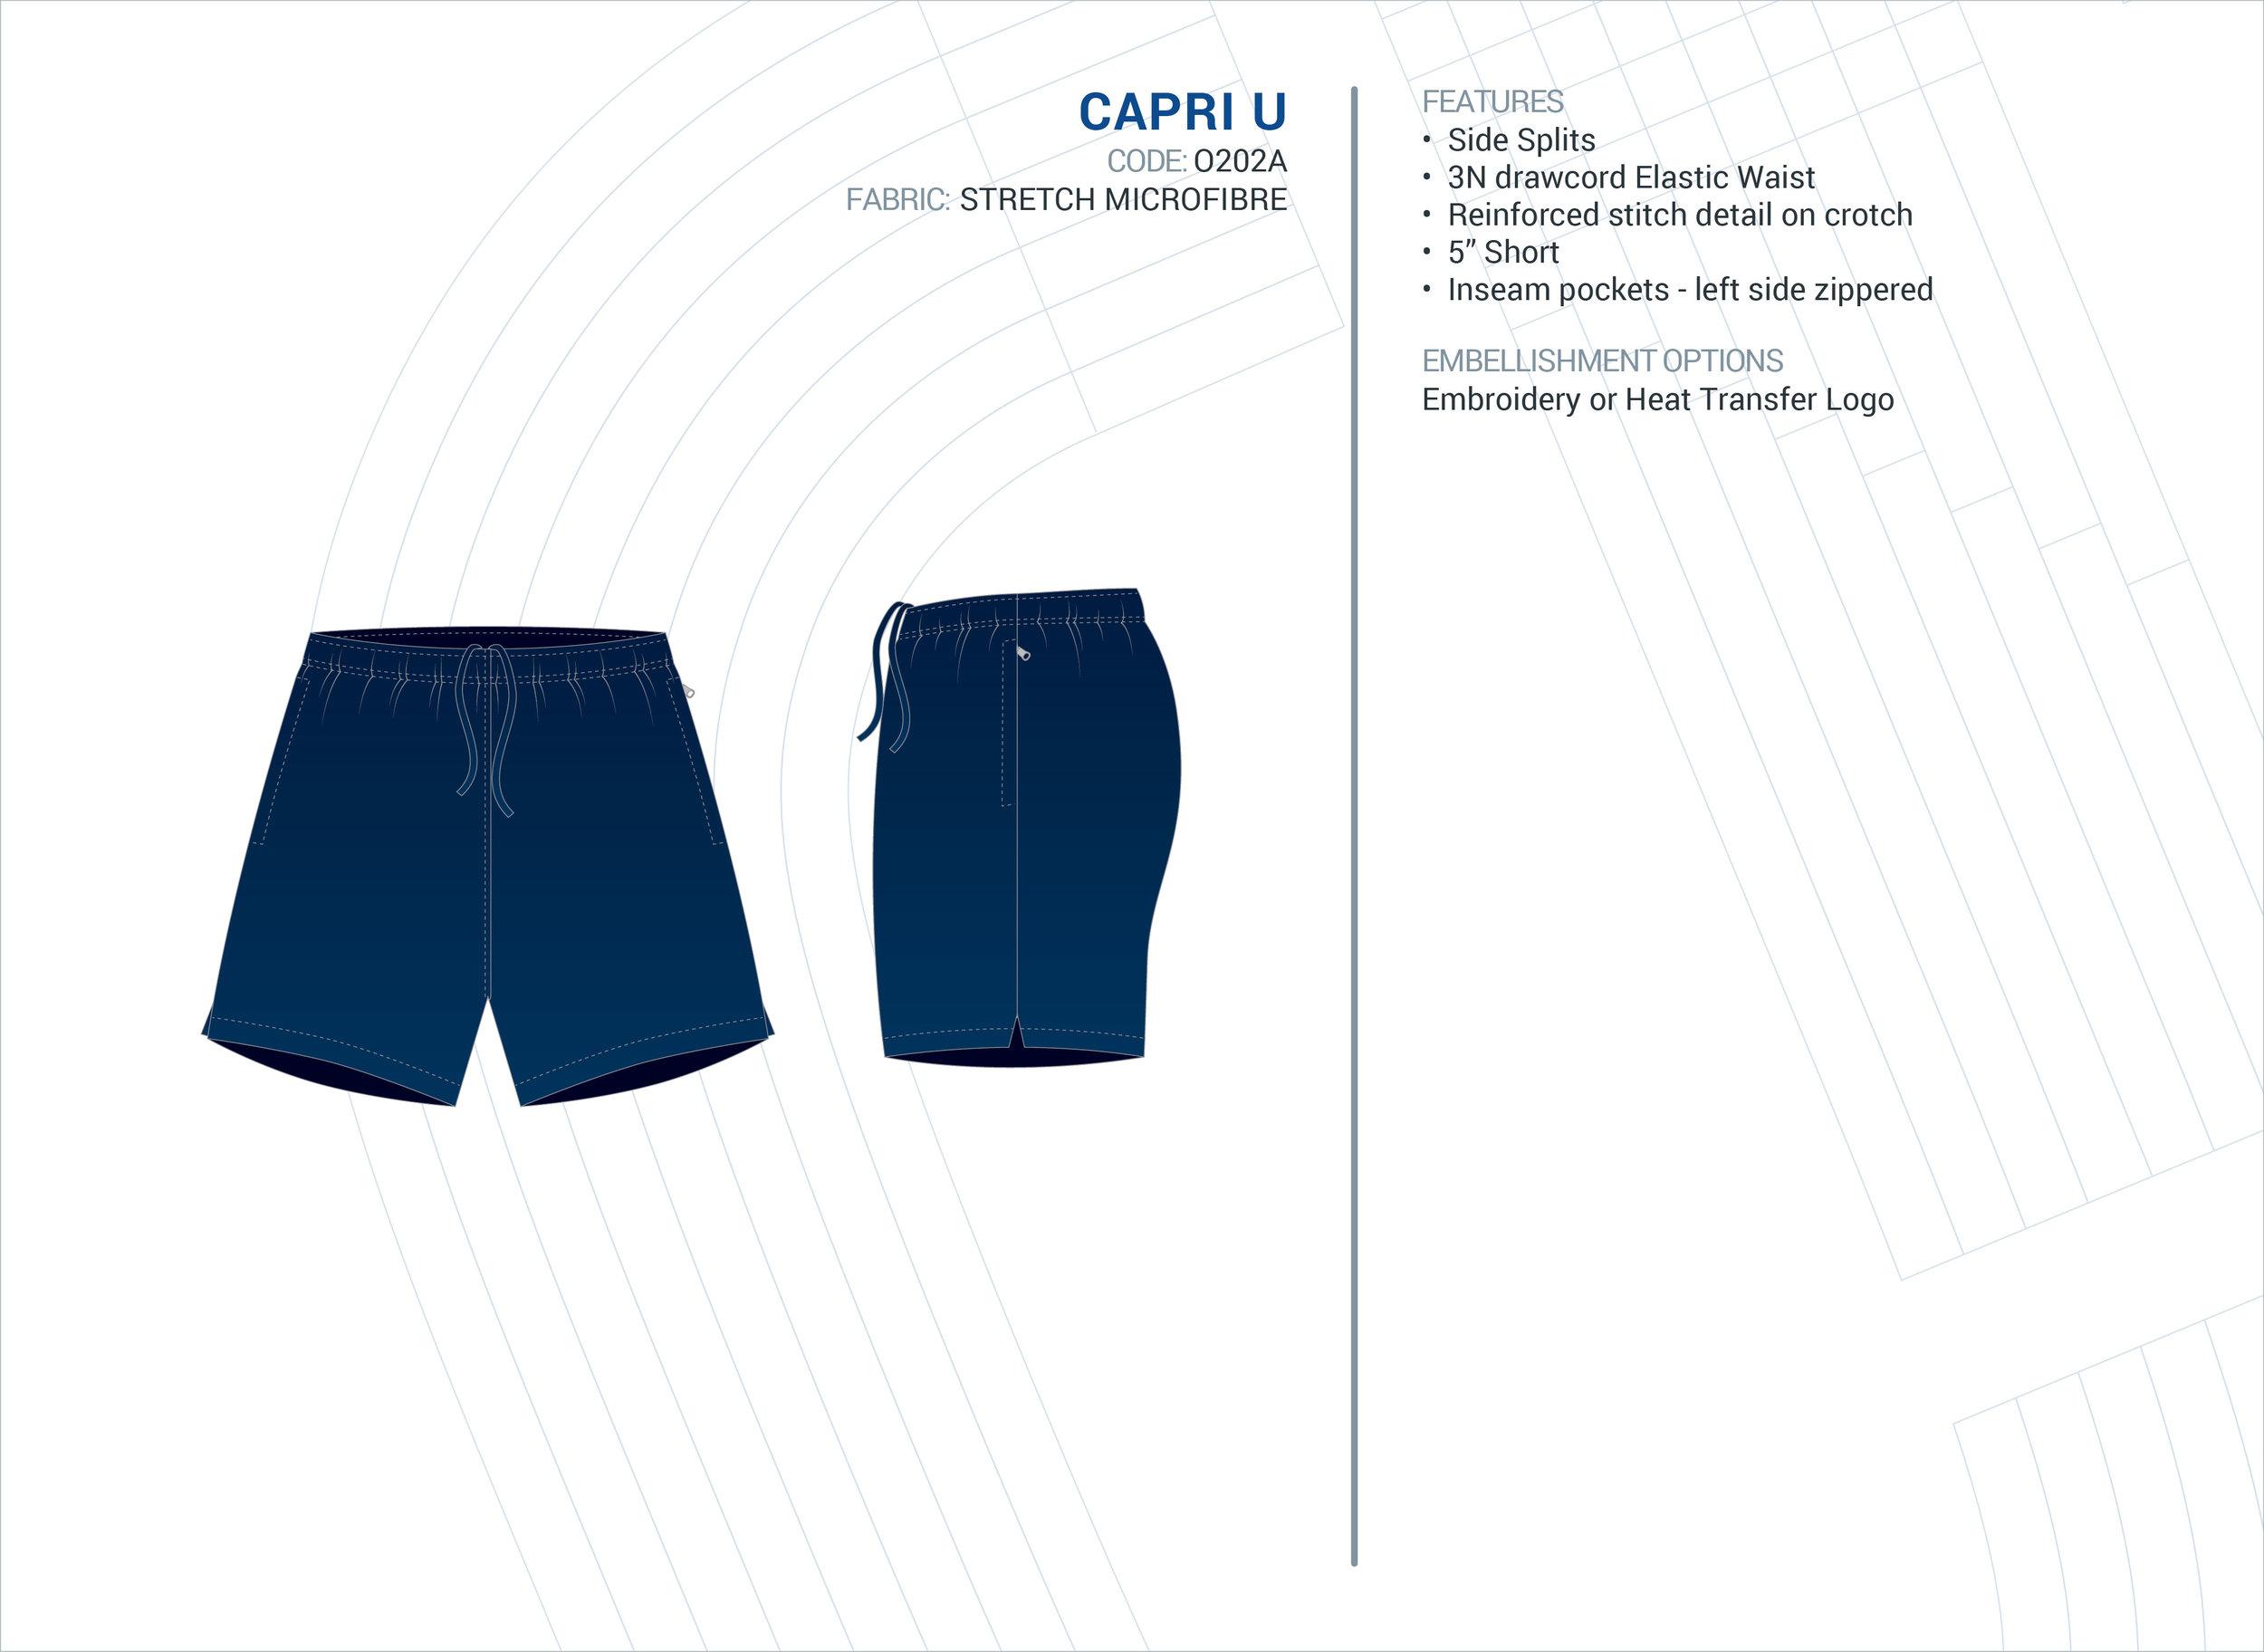 Unisex  Capri  Stretch Microfibre Short